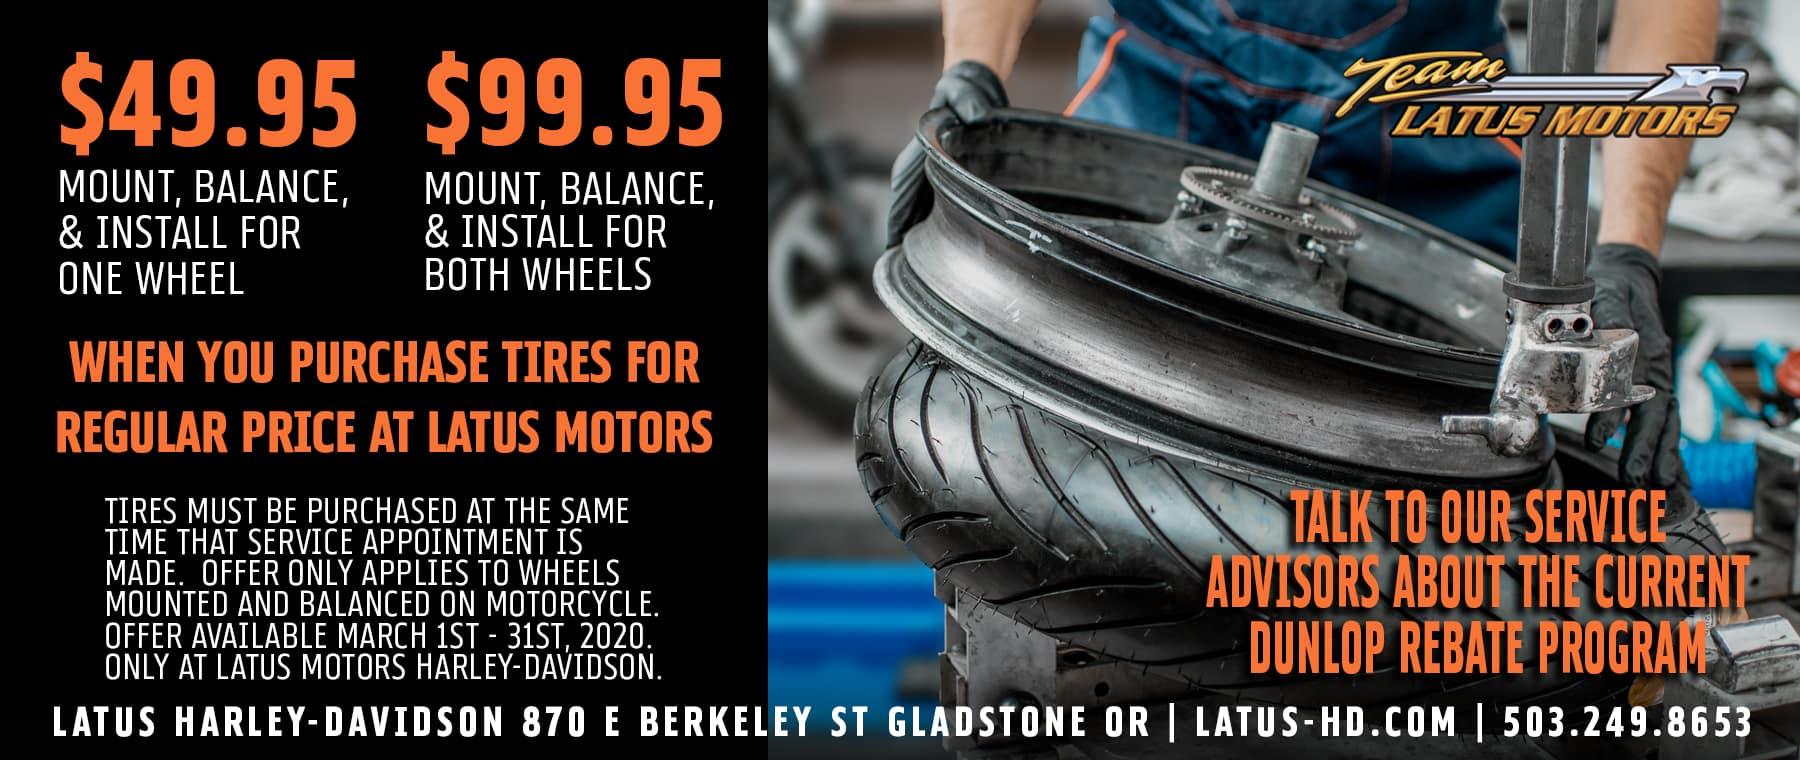 Latus Motors Tire Installation Special